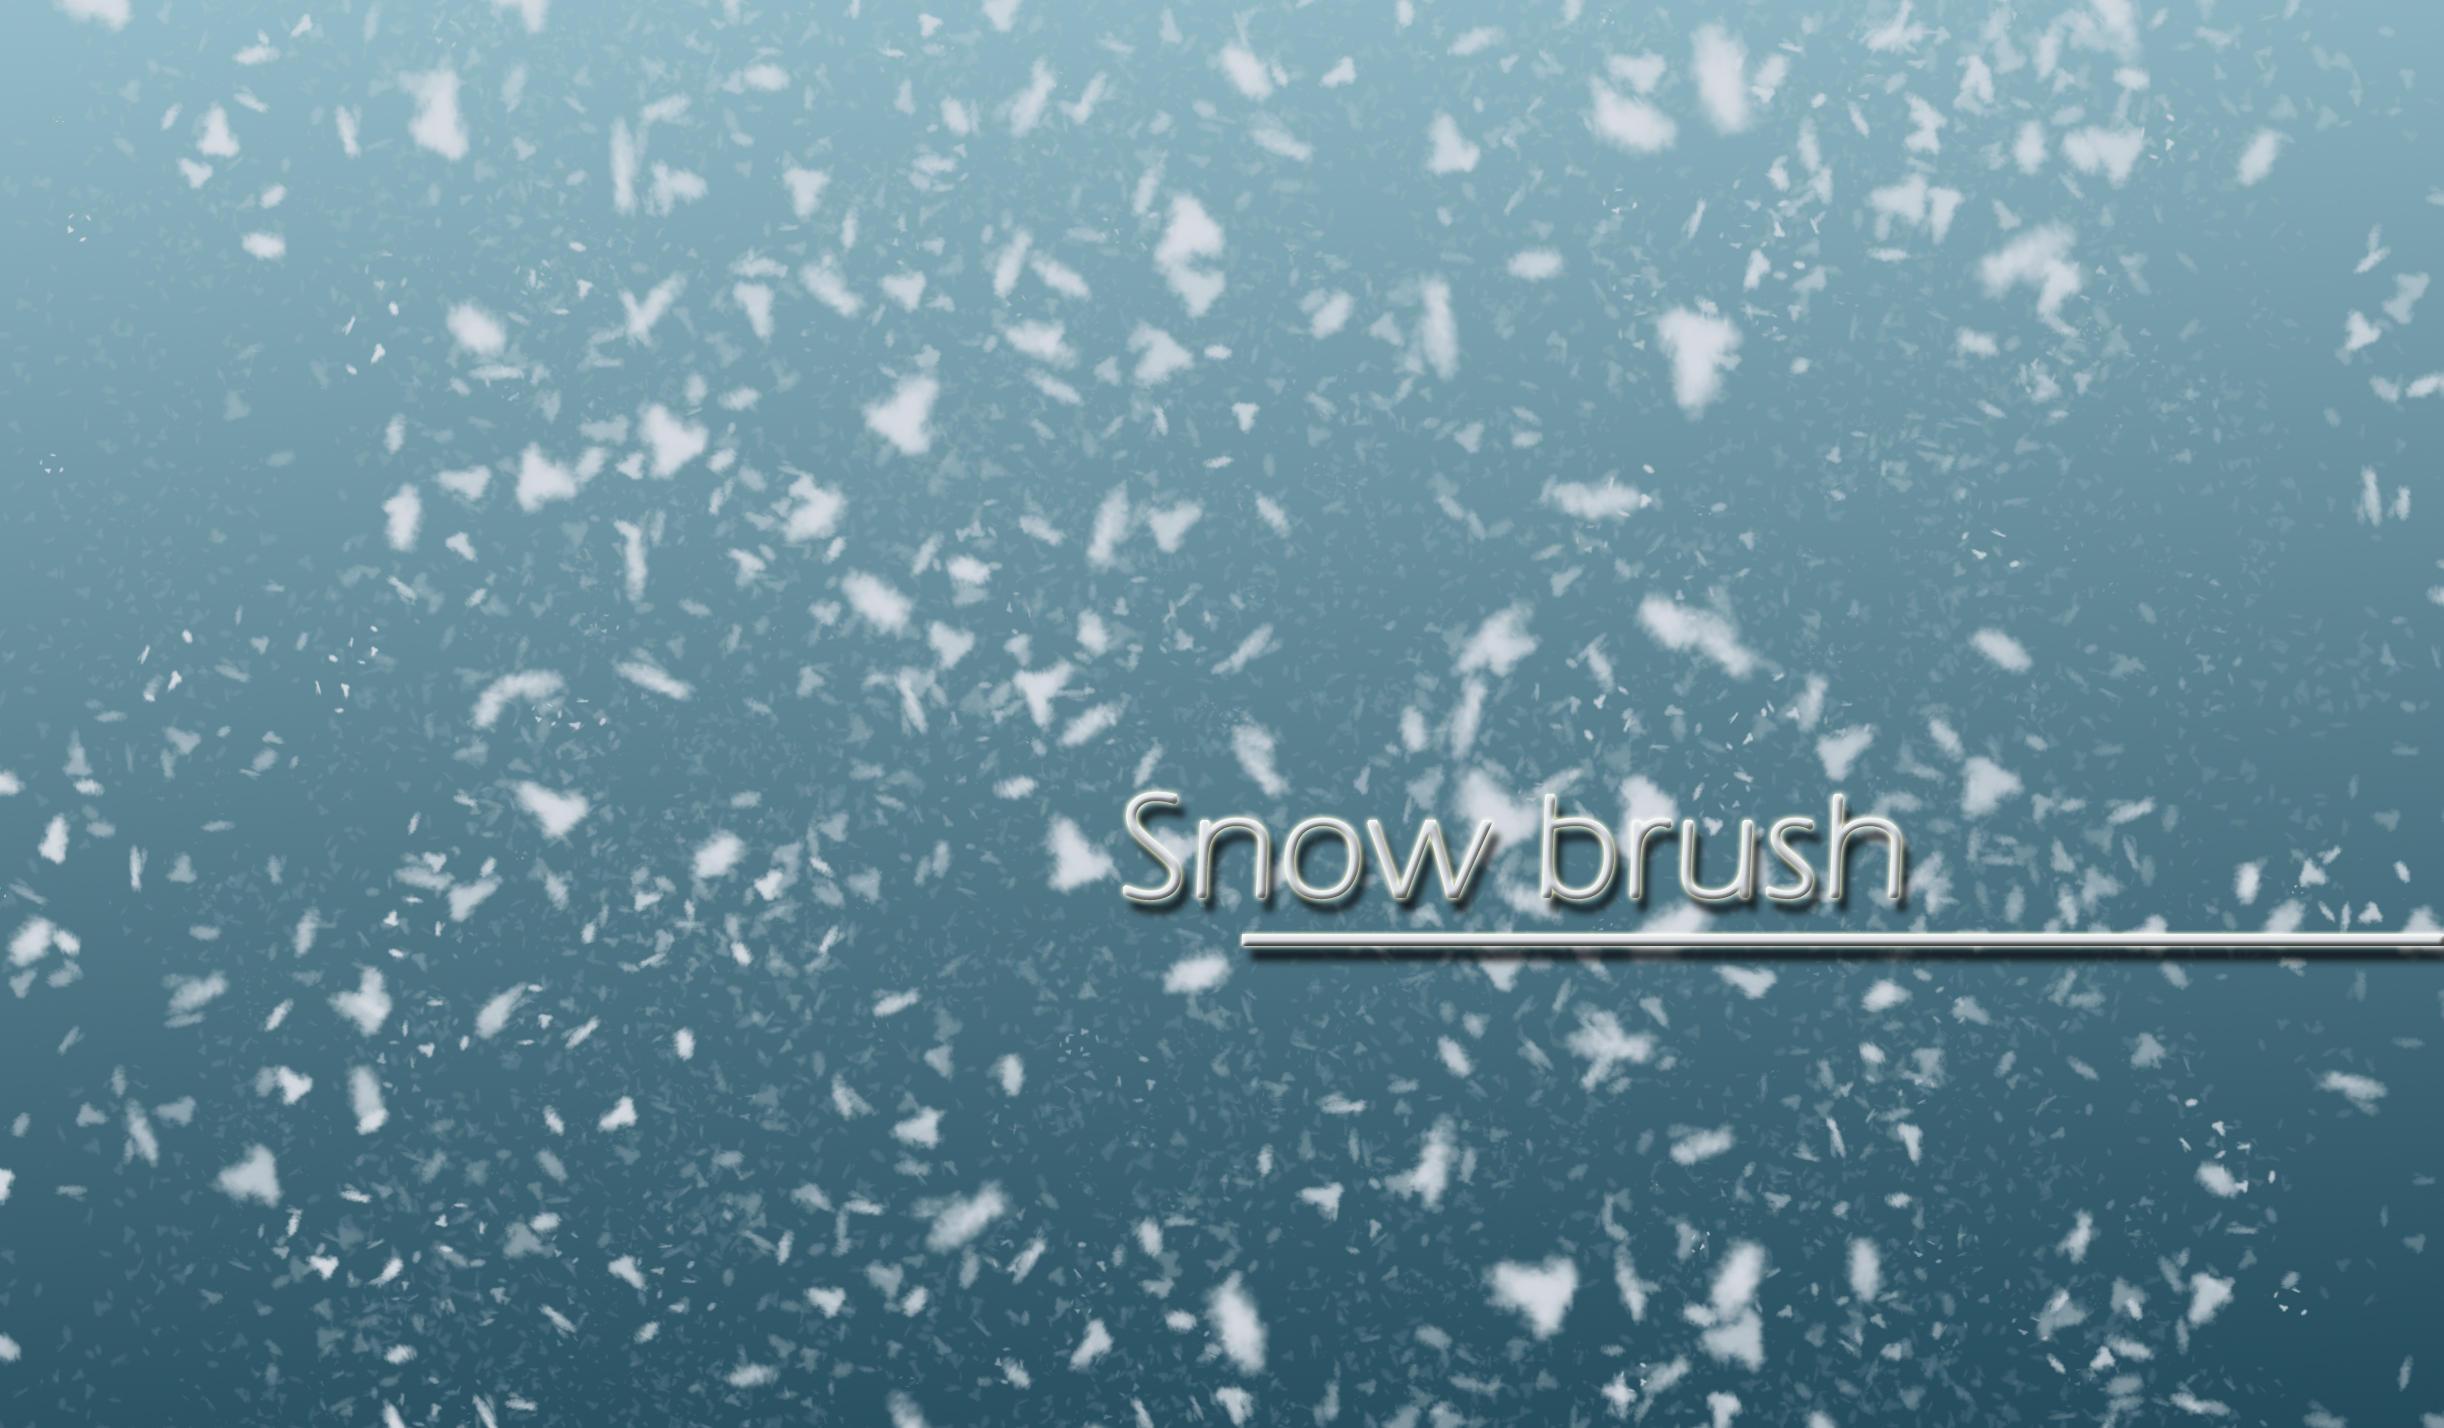 Snow brush by carocha